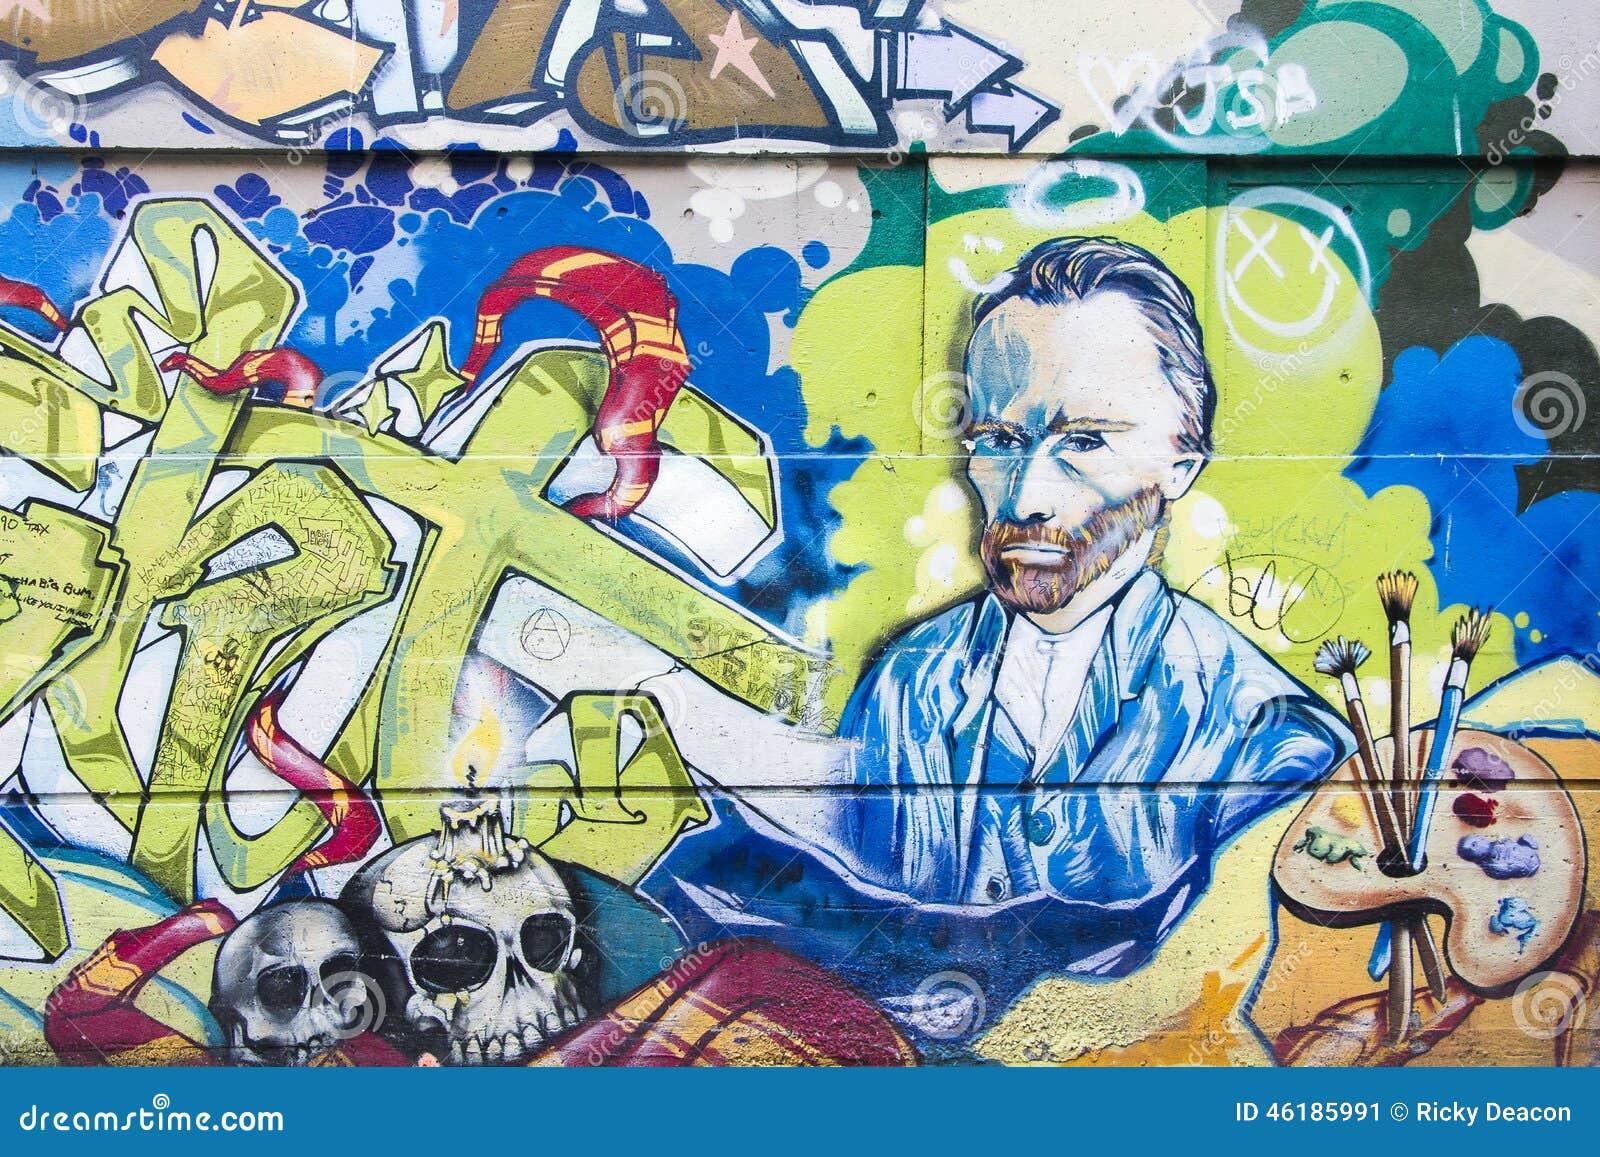 street art | Scott Debus